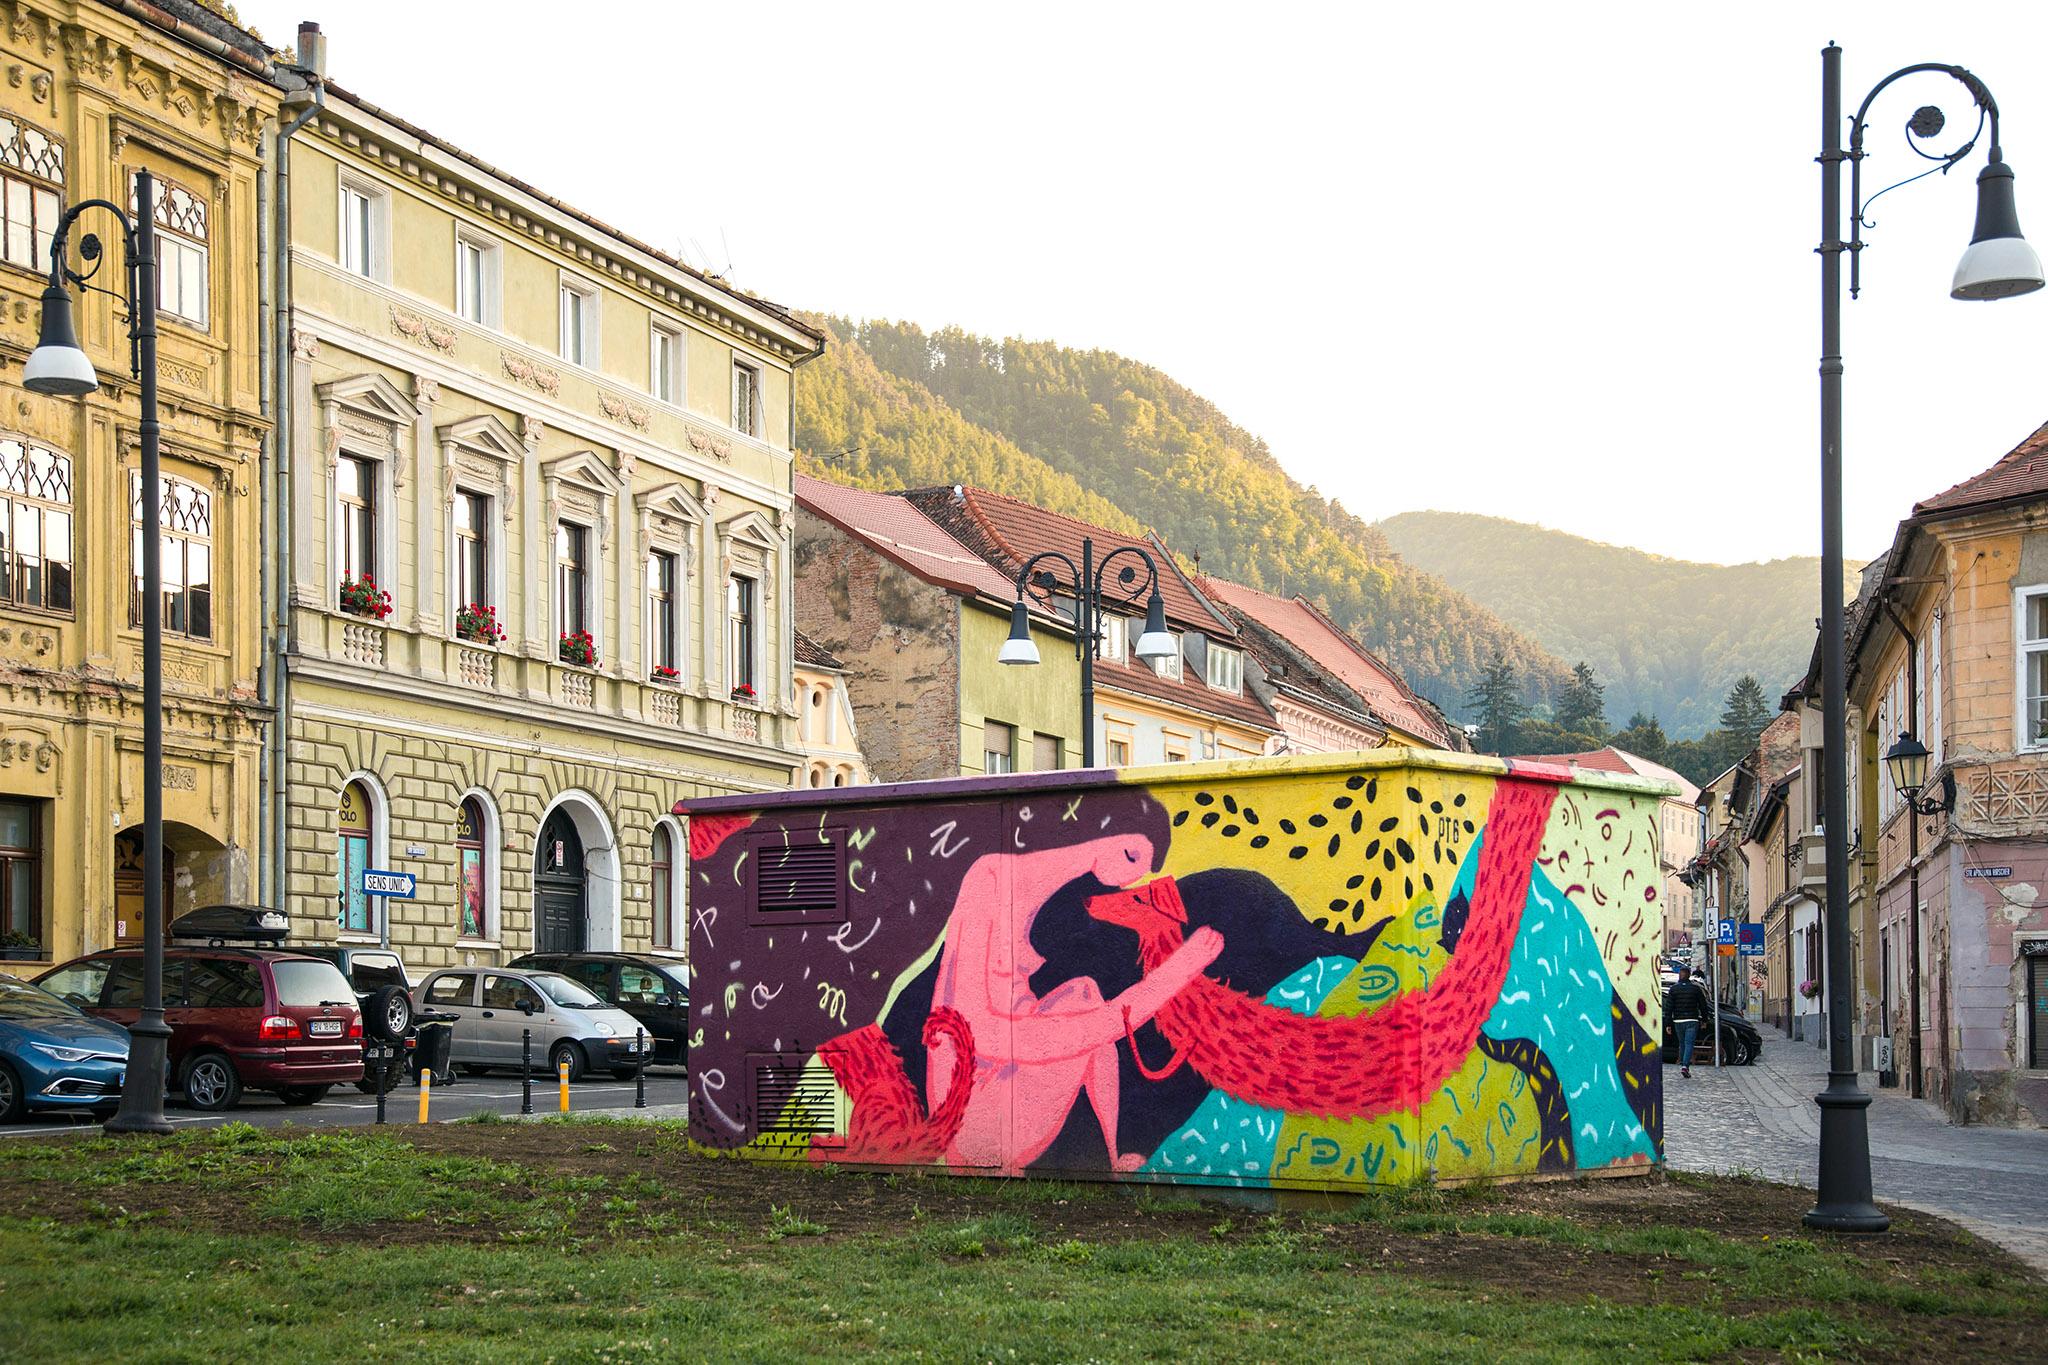 2021 SANDI + OANA - Un-hidden Romania x Amural, Brasov, foto Orsolya Balint